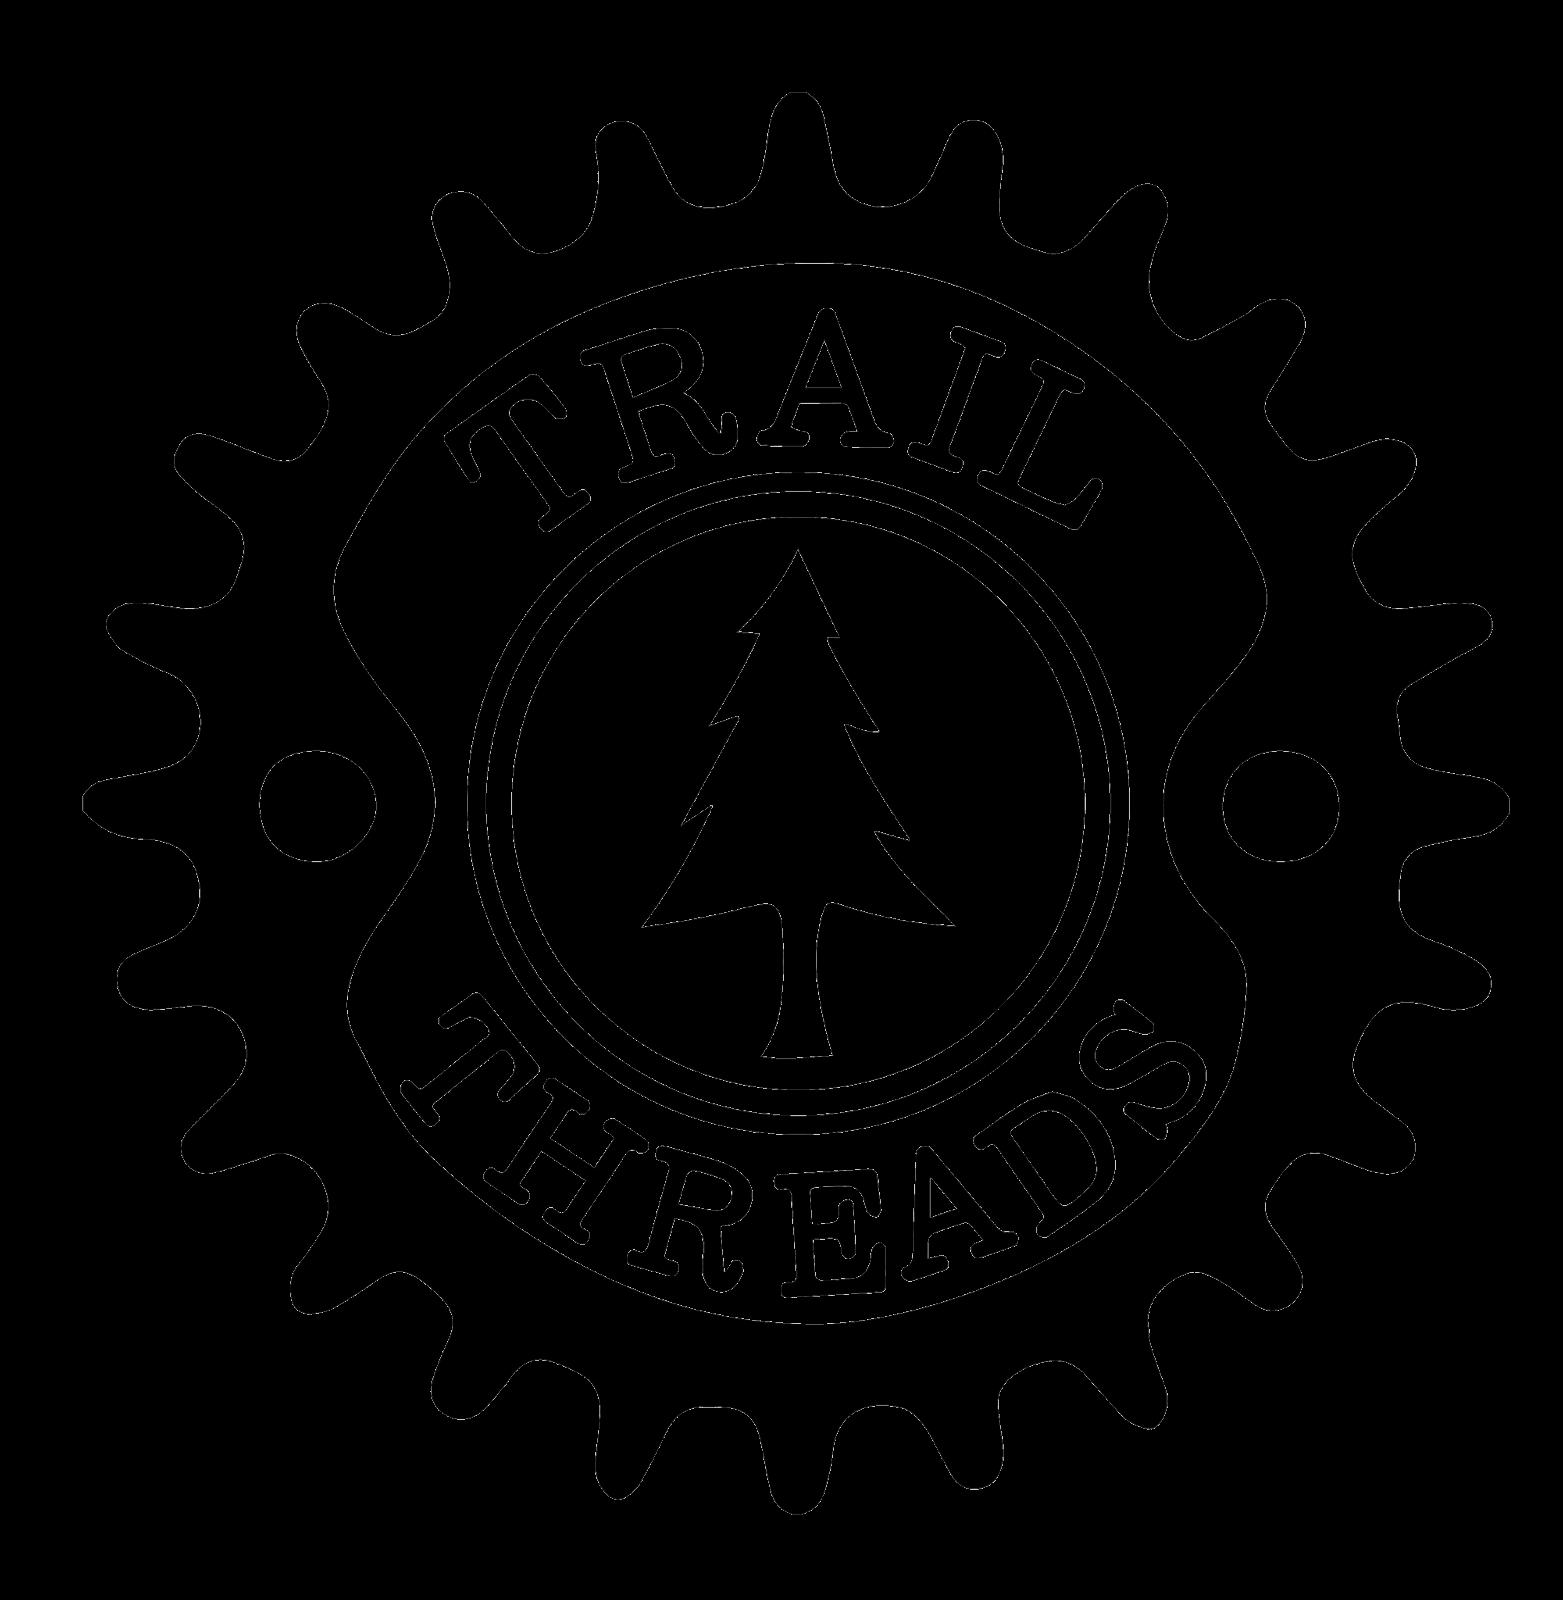 Trail threads logo by Crowerks